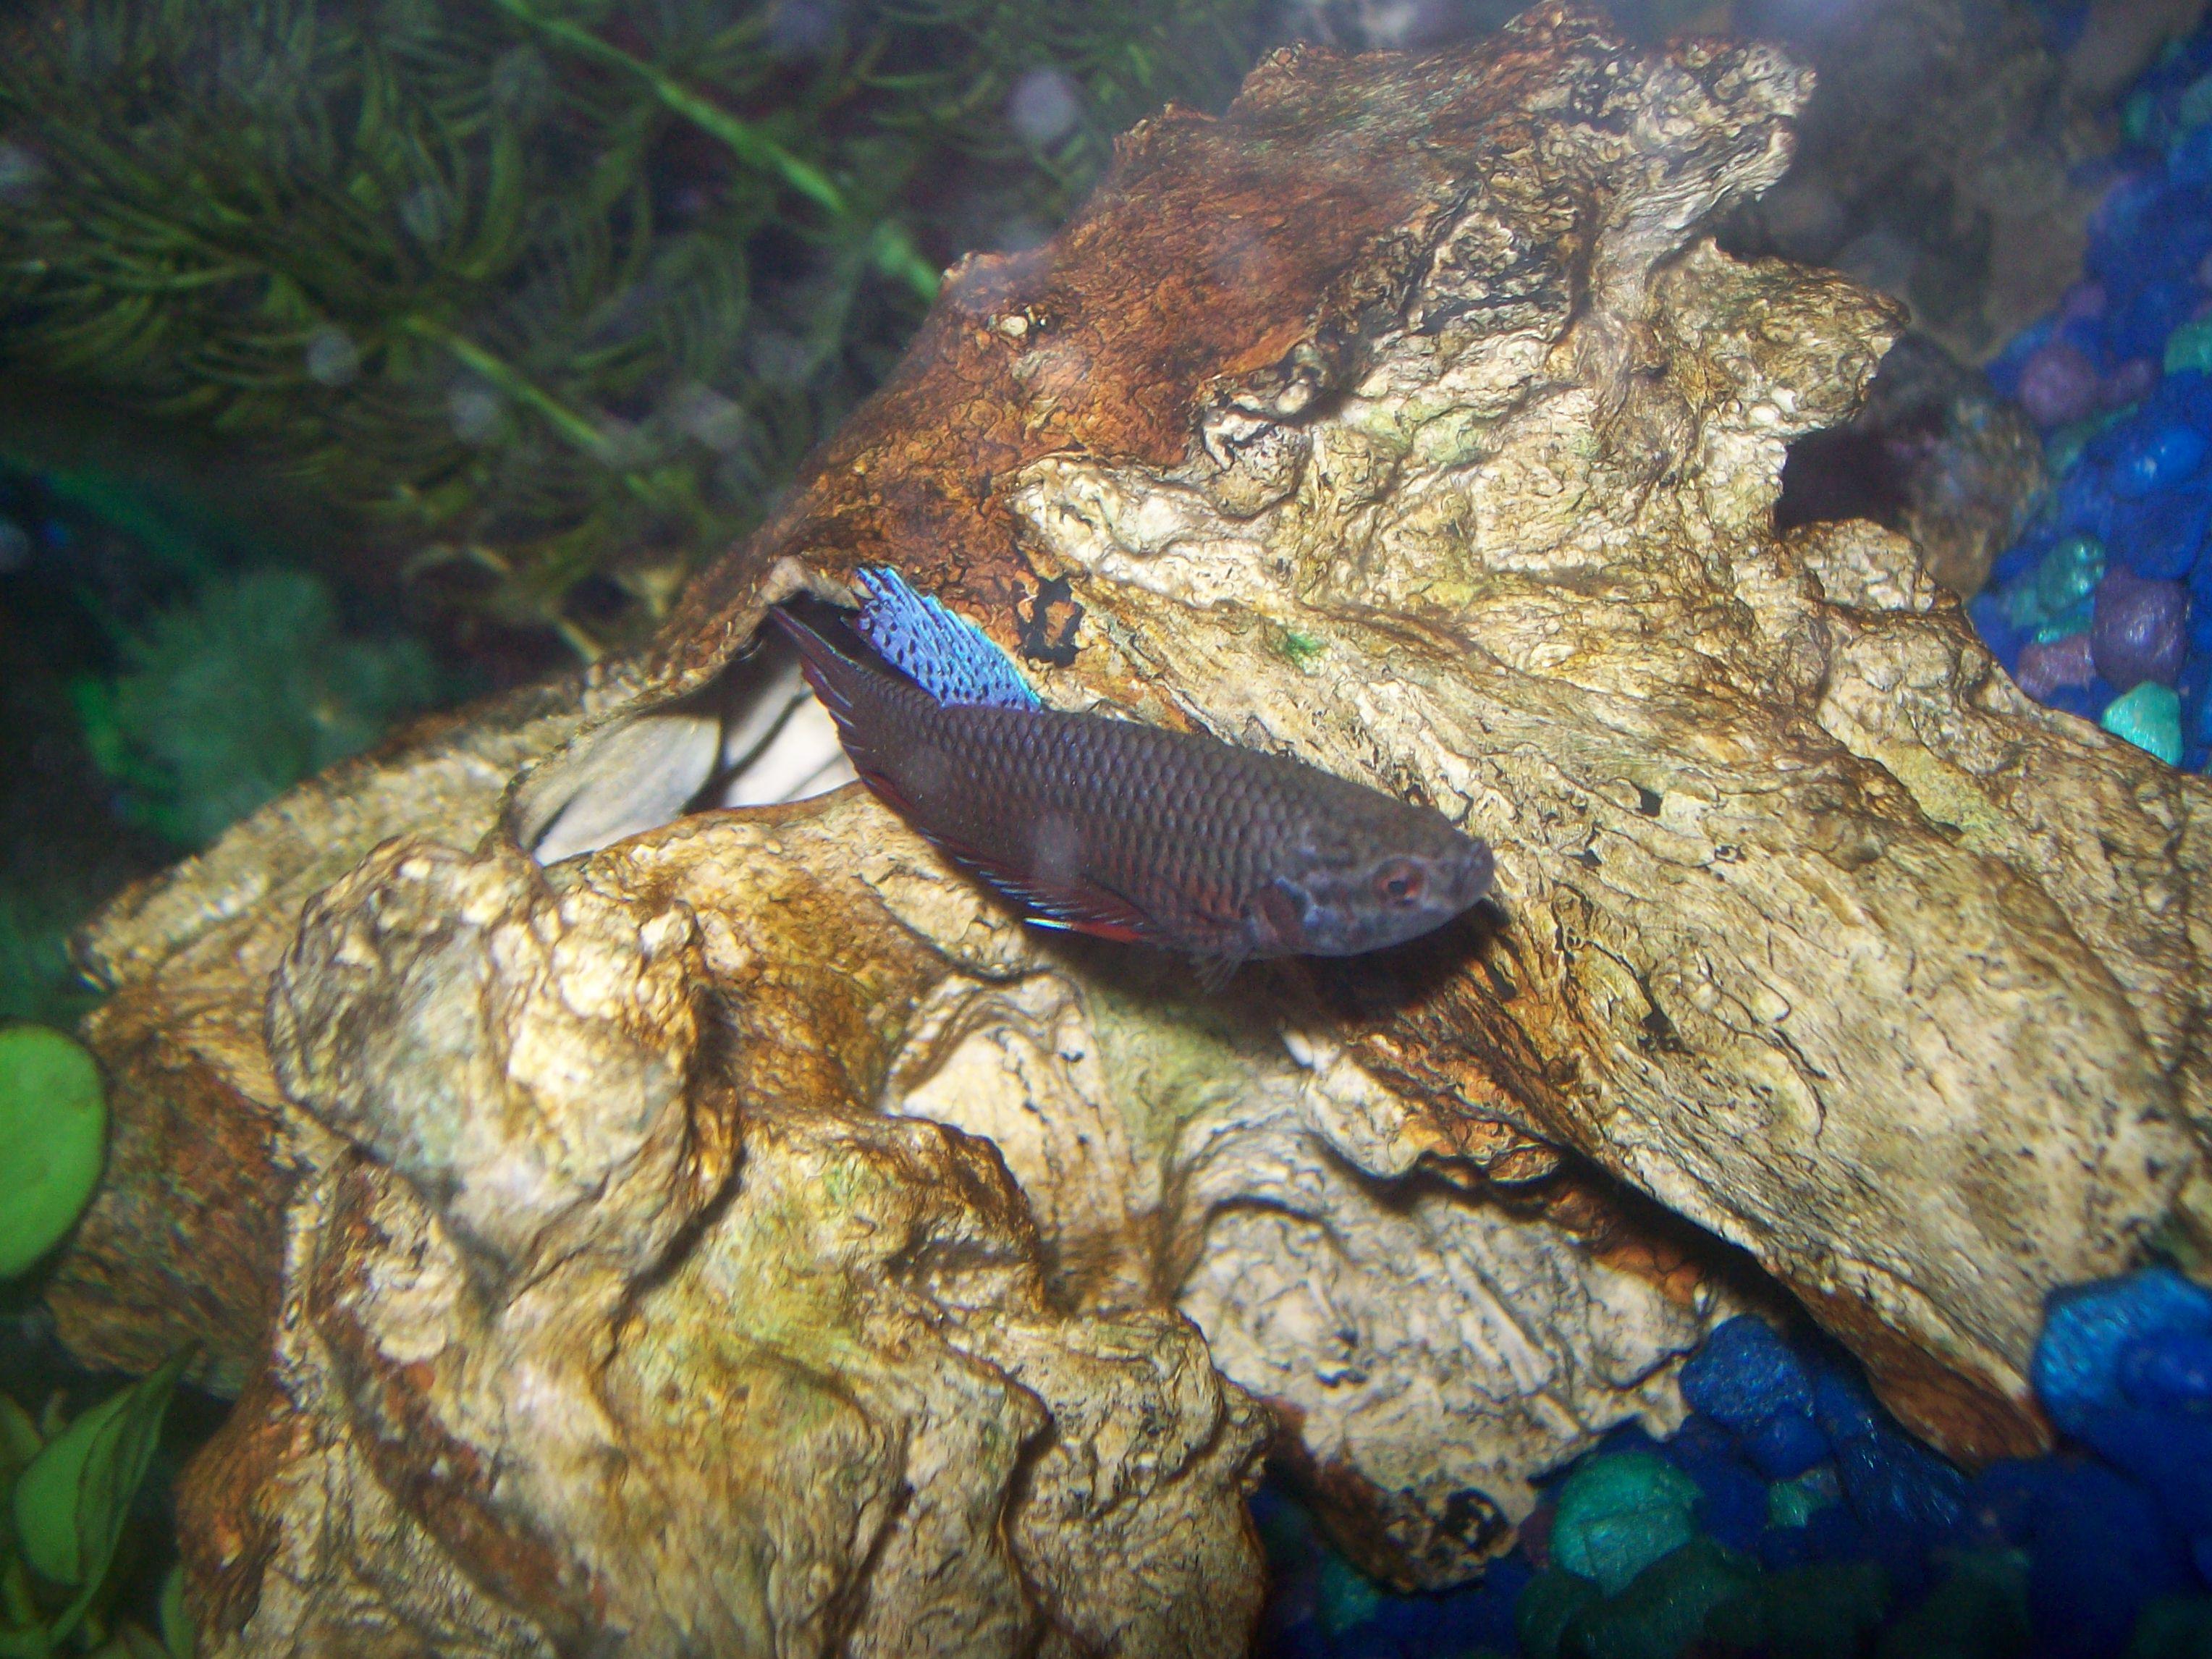 Betta fish in the wild - photo#12